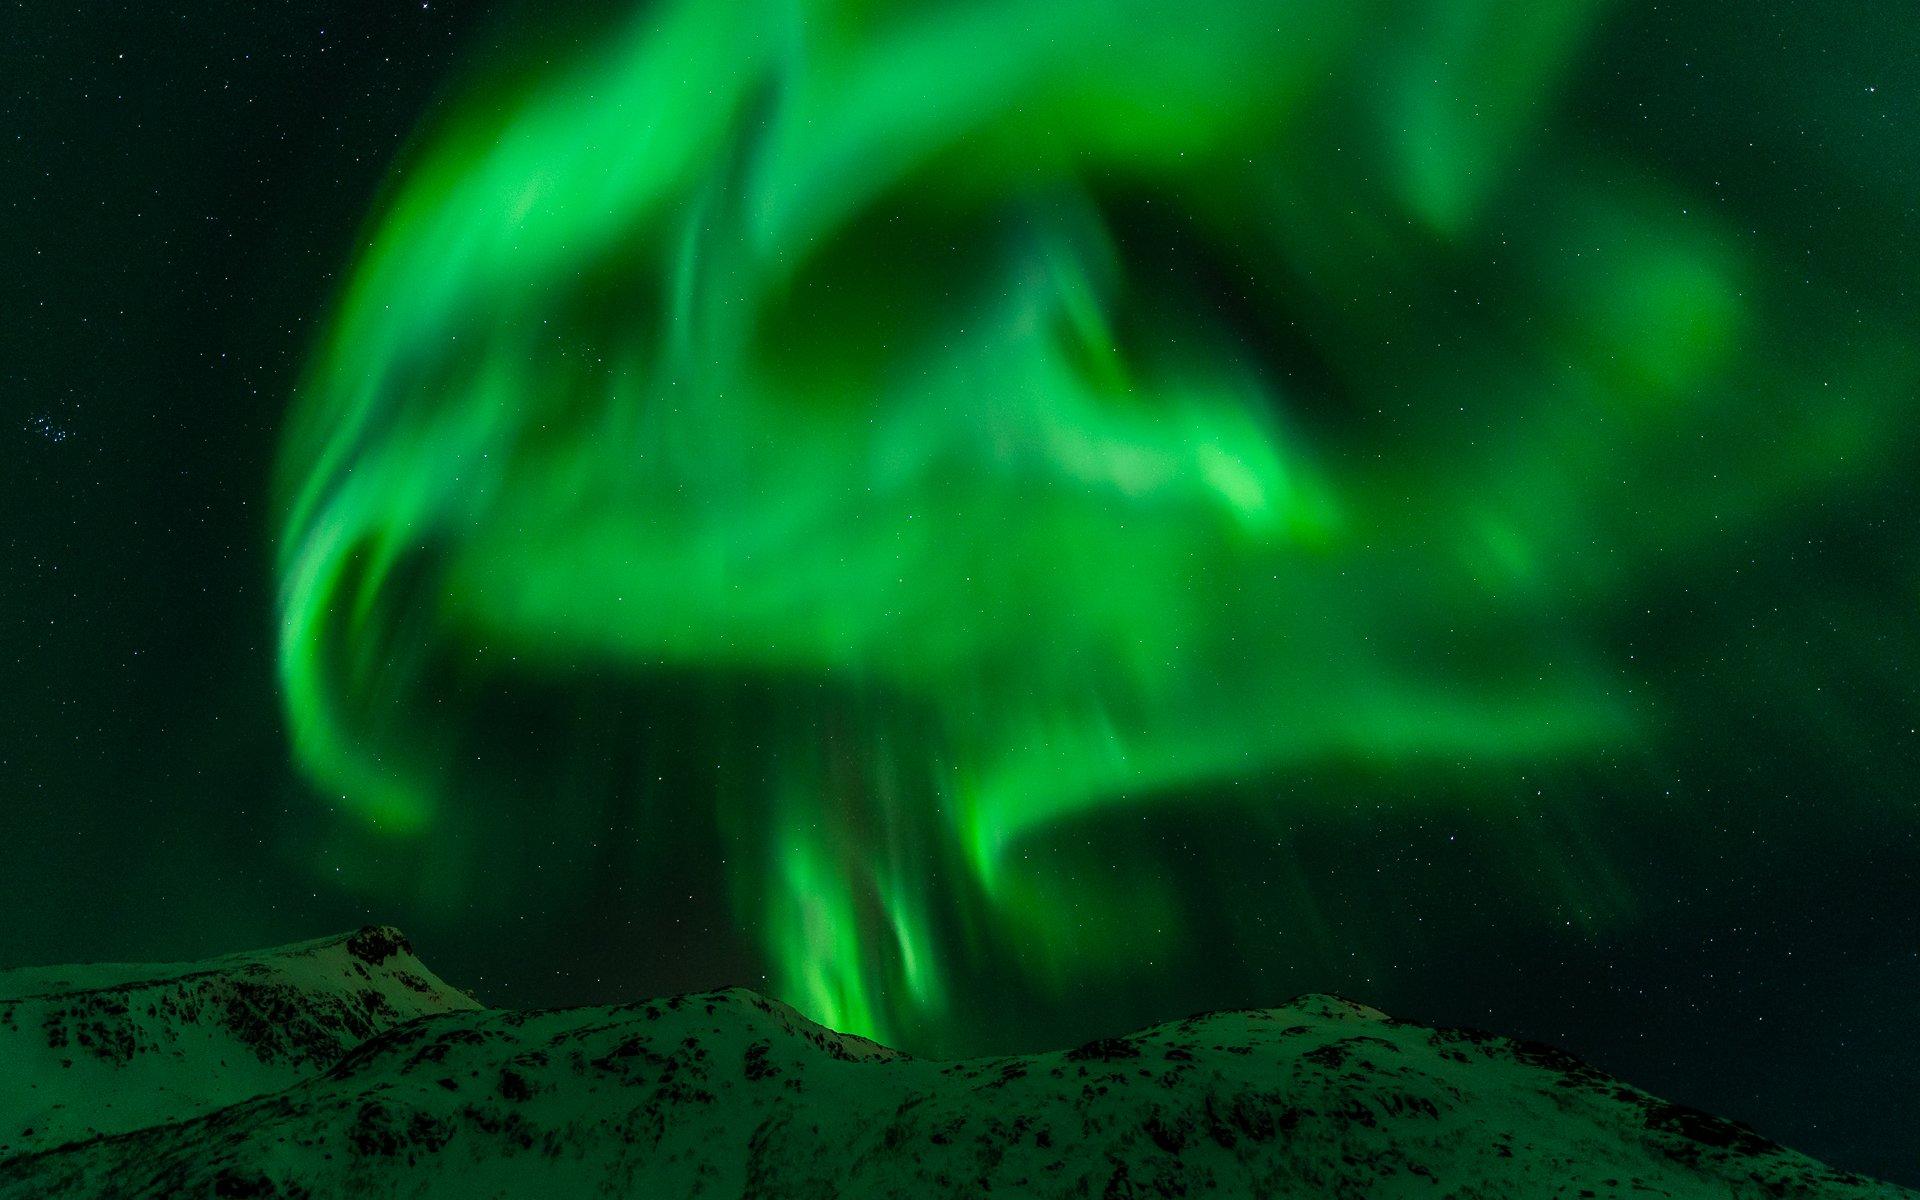 Green aurora borealis aurora borealis northern lights night green